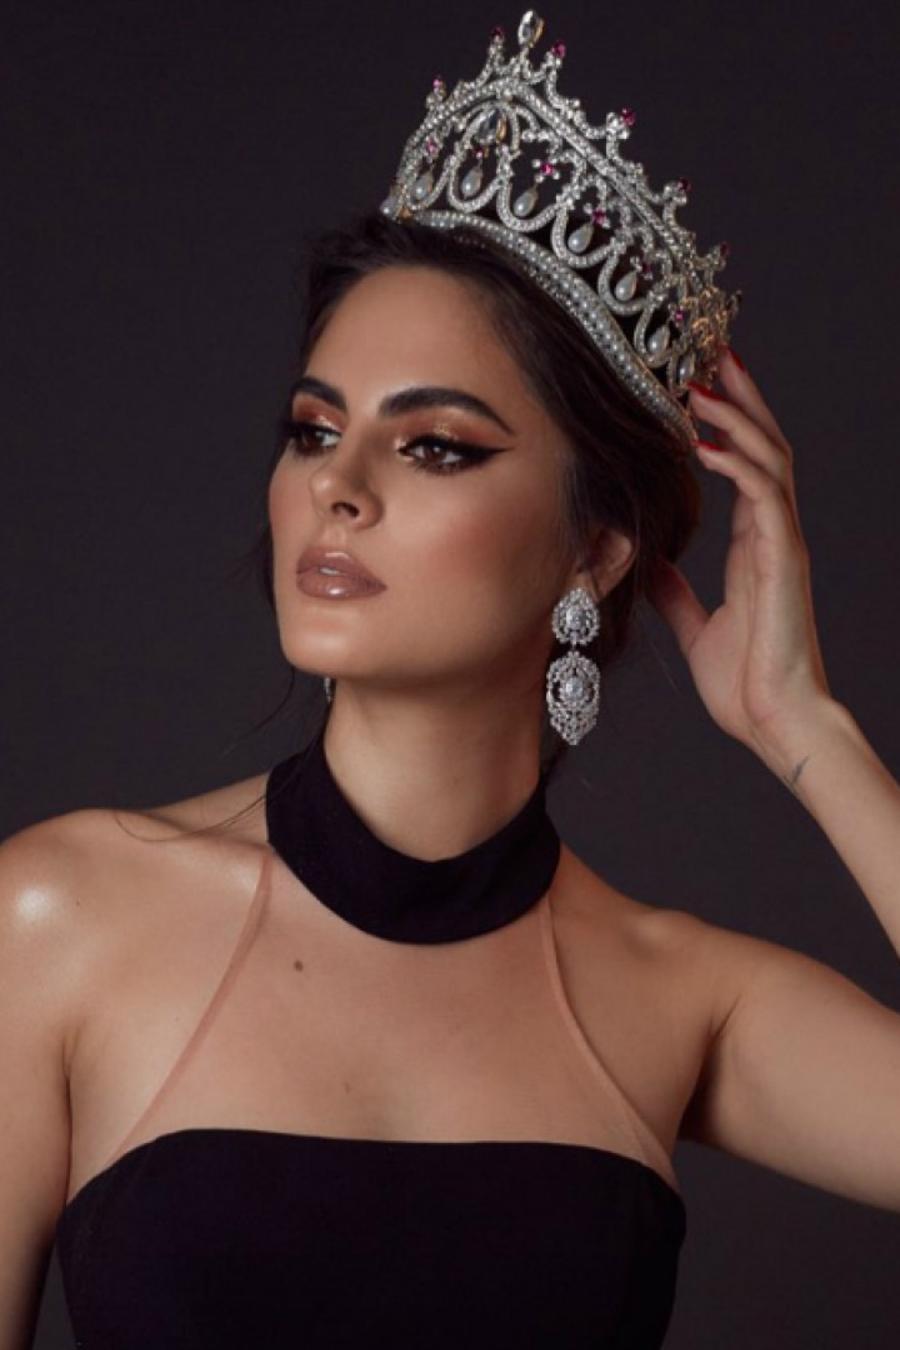 Sofía Aragón, Miss México 2019, Mehr Eliezer, Miss Panamá, Miss Universo 2019